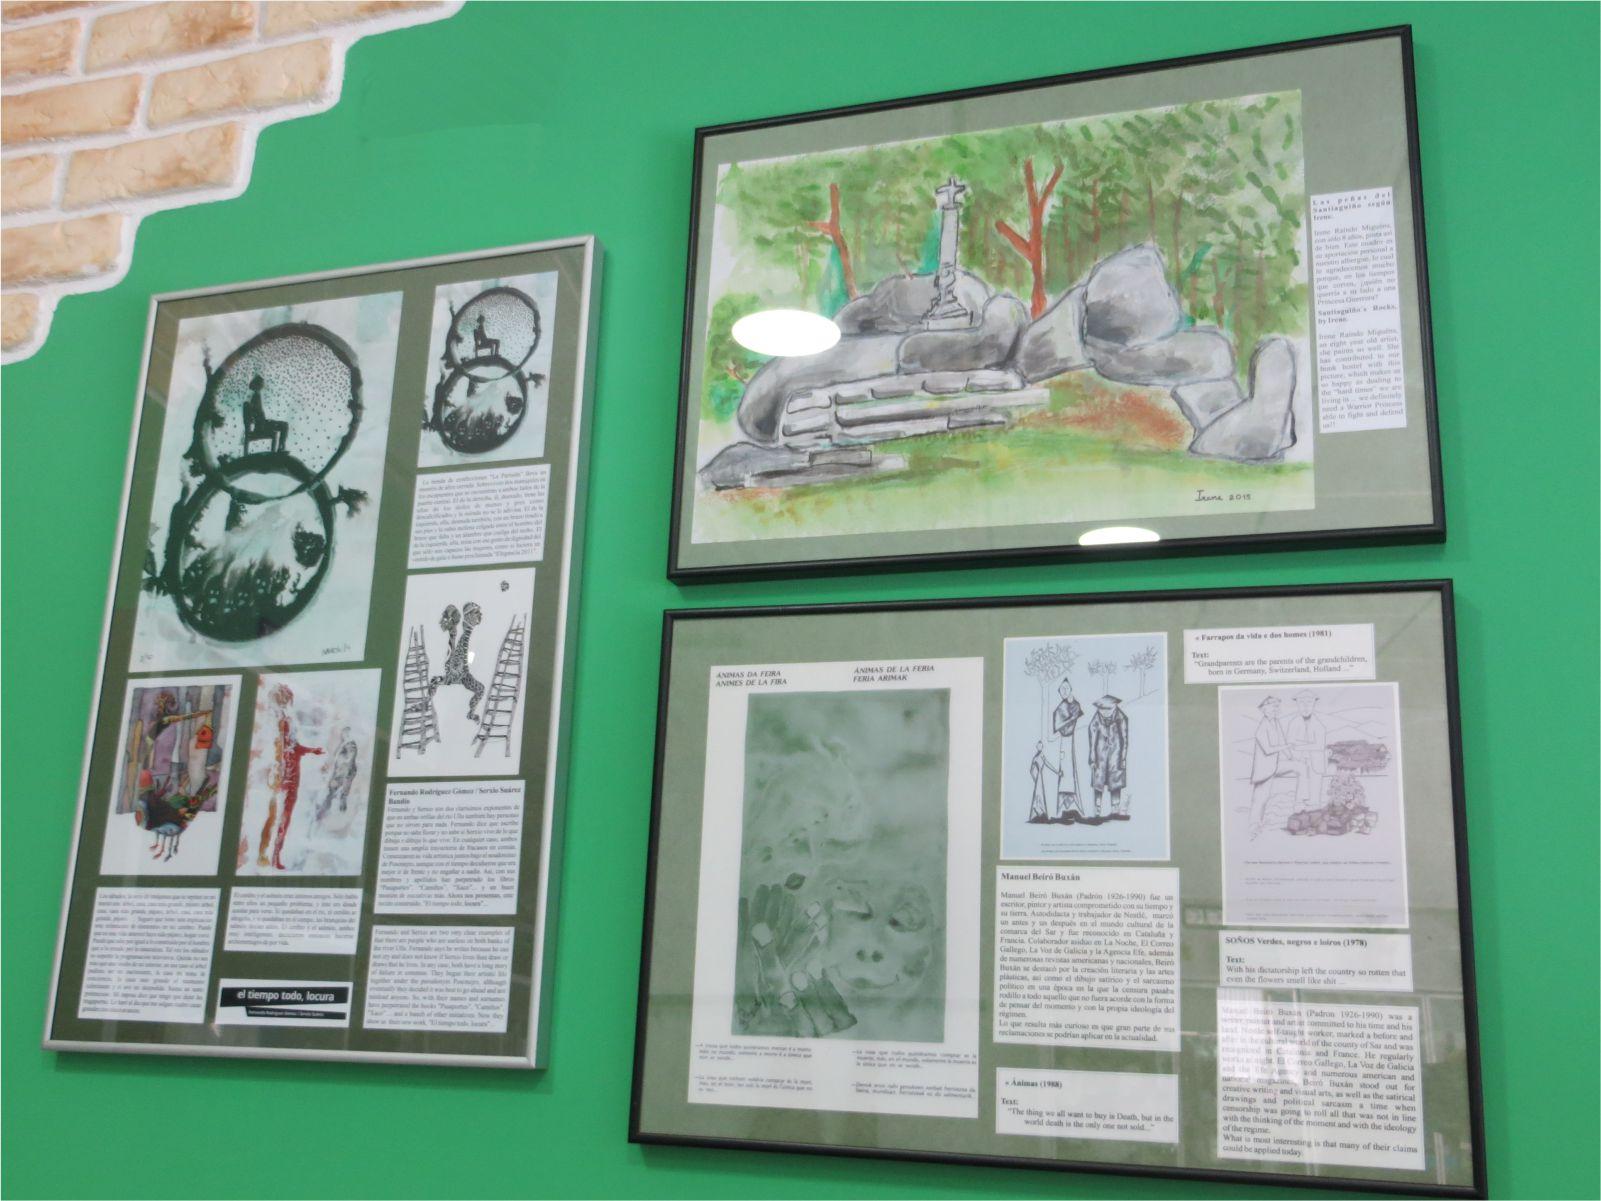 Artistas locales - Local artists - Albergue Corredoiras